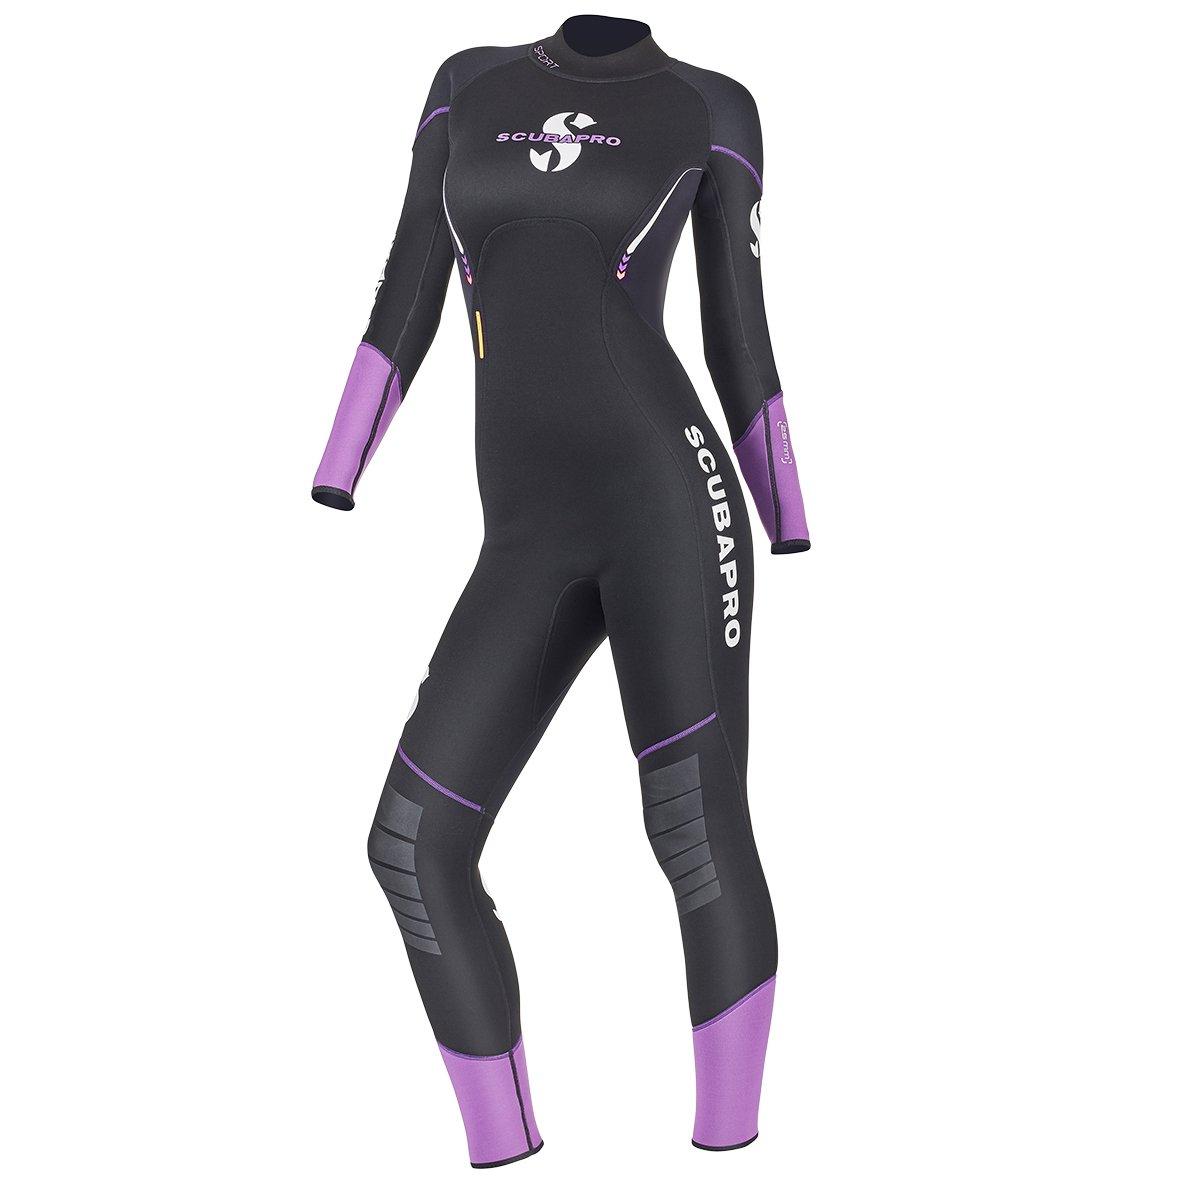 Black//White Scubapro Hybrid Steamer Front Zip 3mm Womens Sleeveless Wetsuit